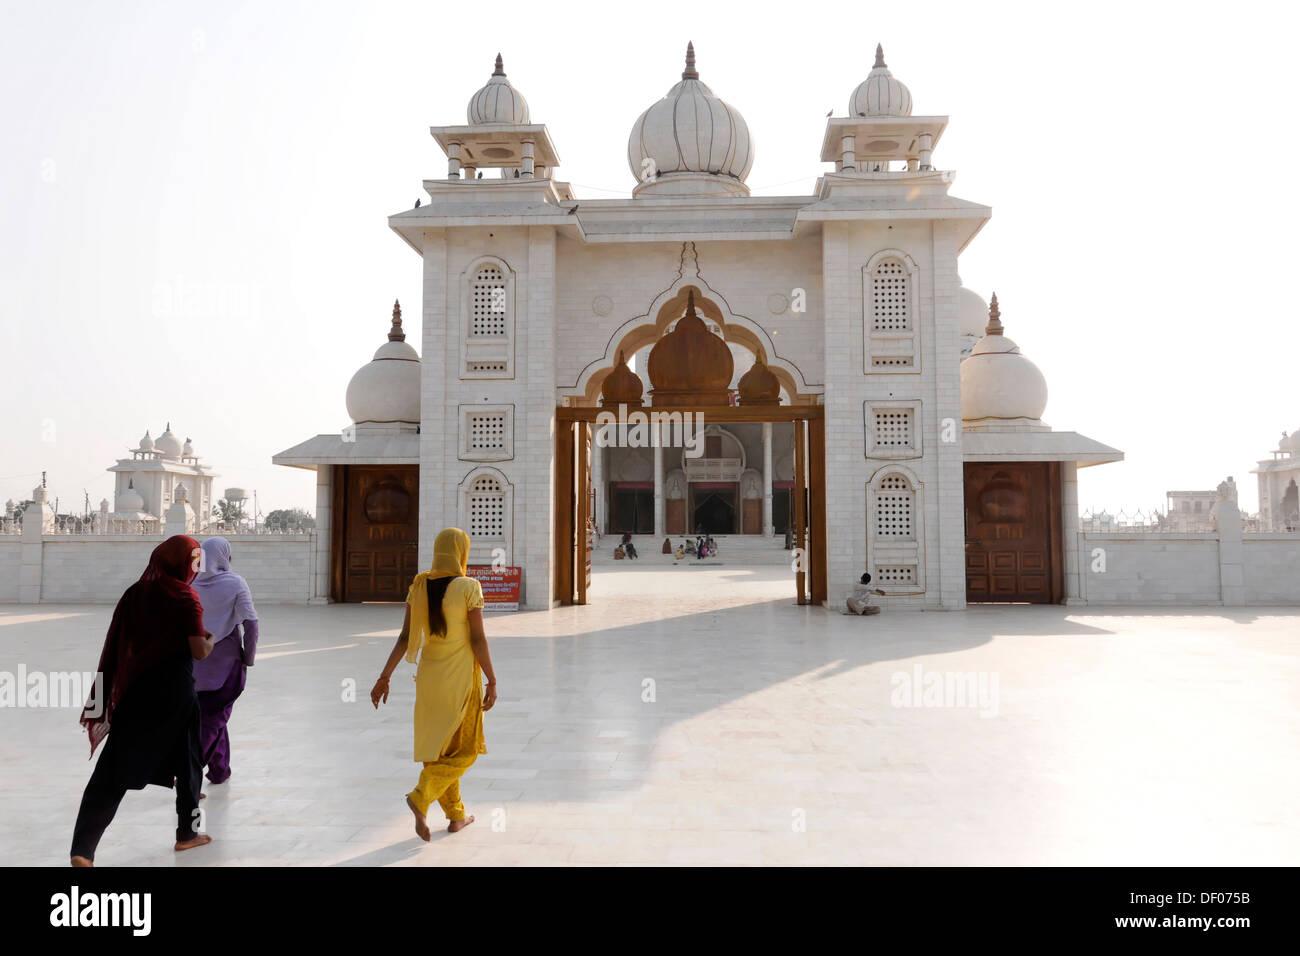 Jai Gurudev Temple, also known as Naam yog Sadhna Mandir, near Mathura, Uttar Pradesh, northern India, Asia - Stock Image